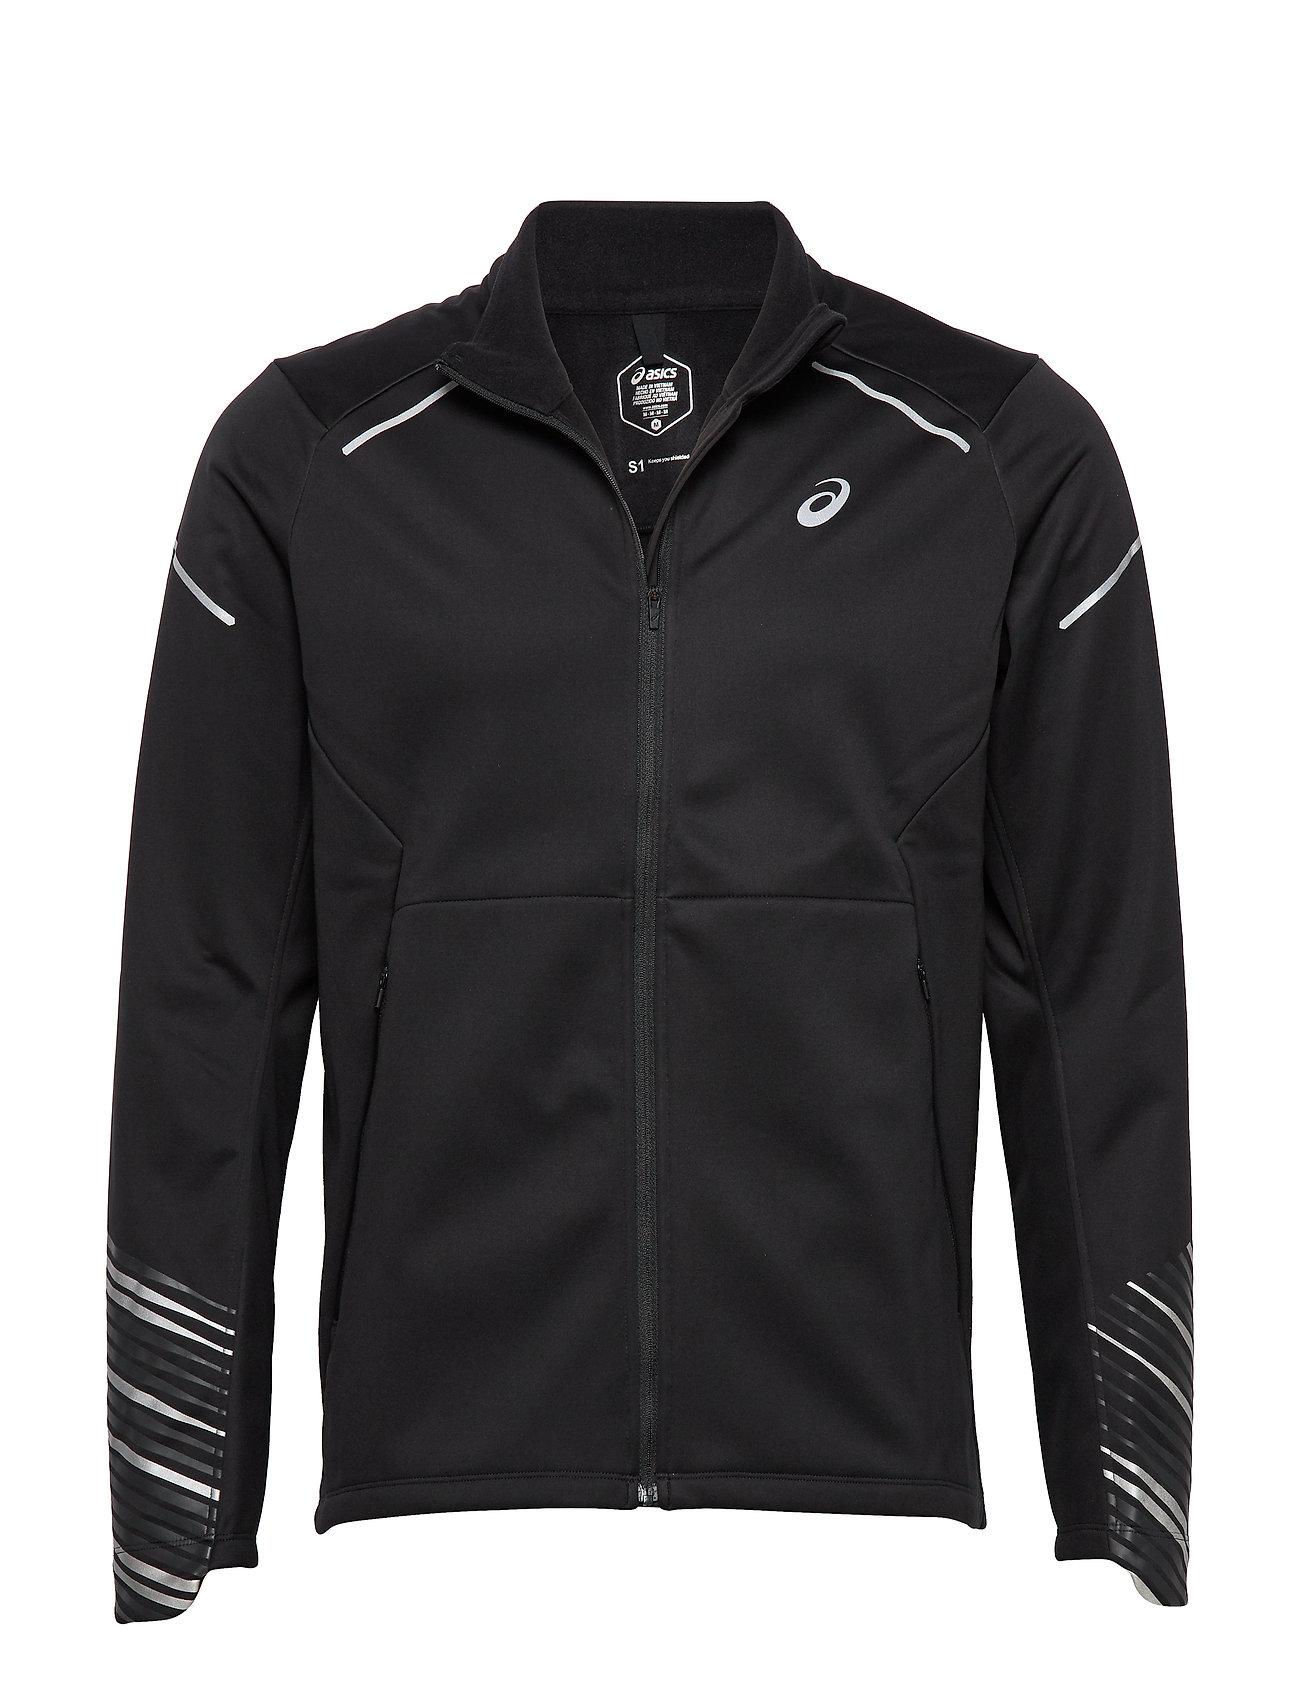 ASICS Lite-Show 2 Winter Jacket Outerwear Sport Jackets Schwarz ASICS